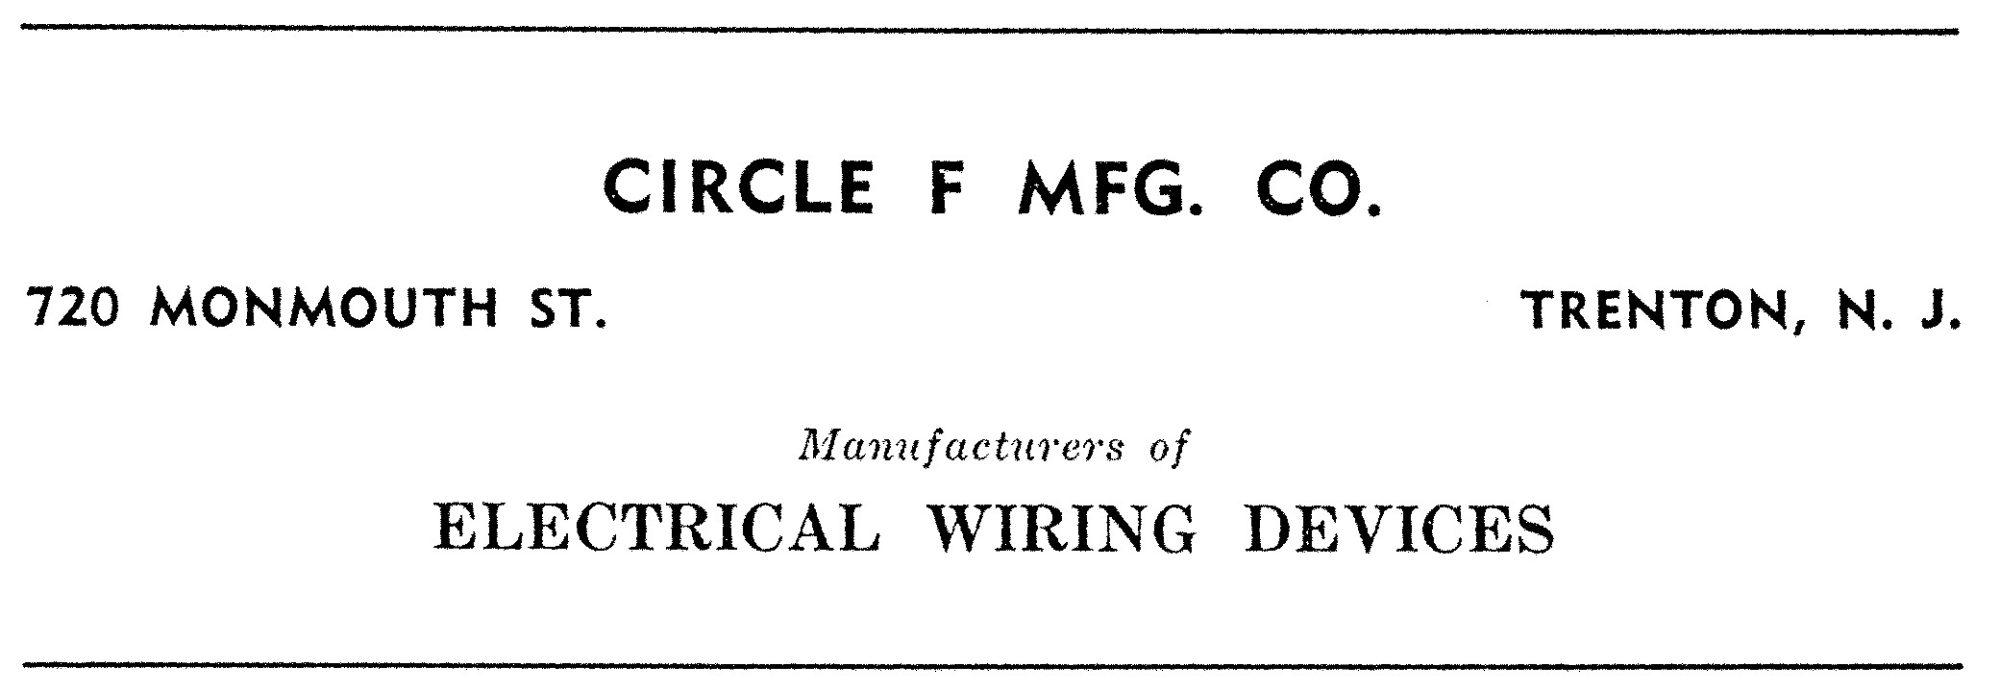 Circle F Mfg Ad